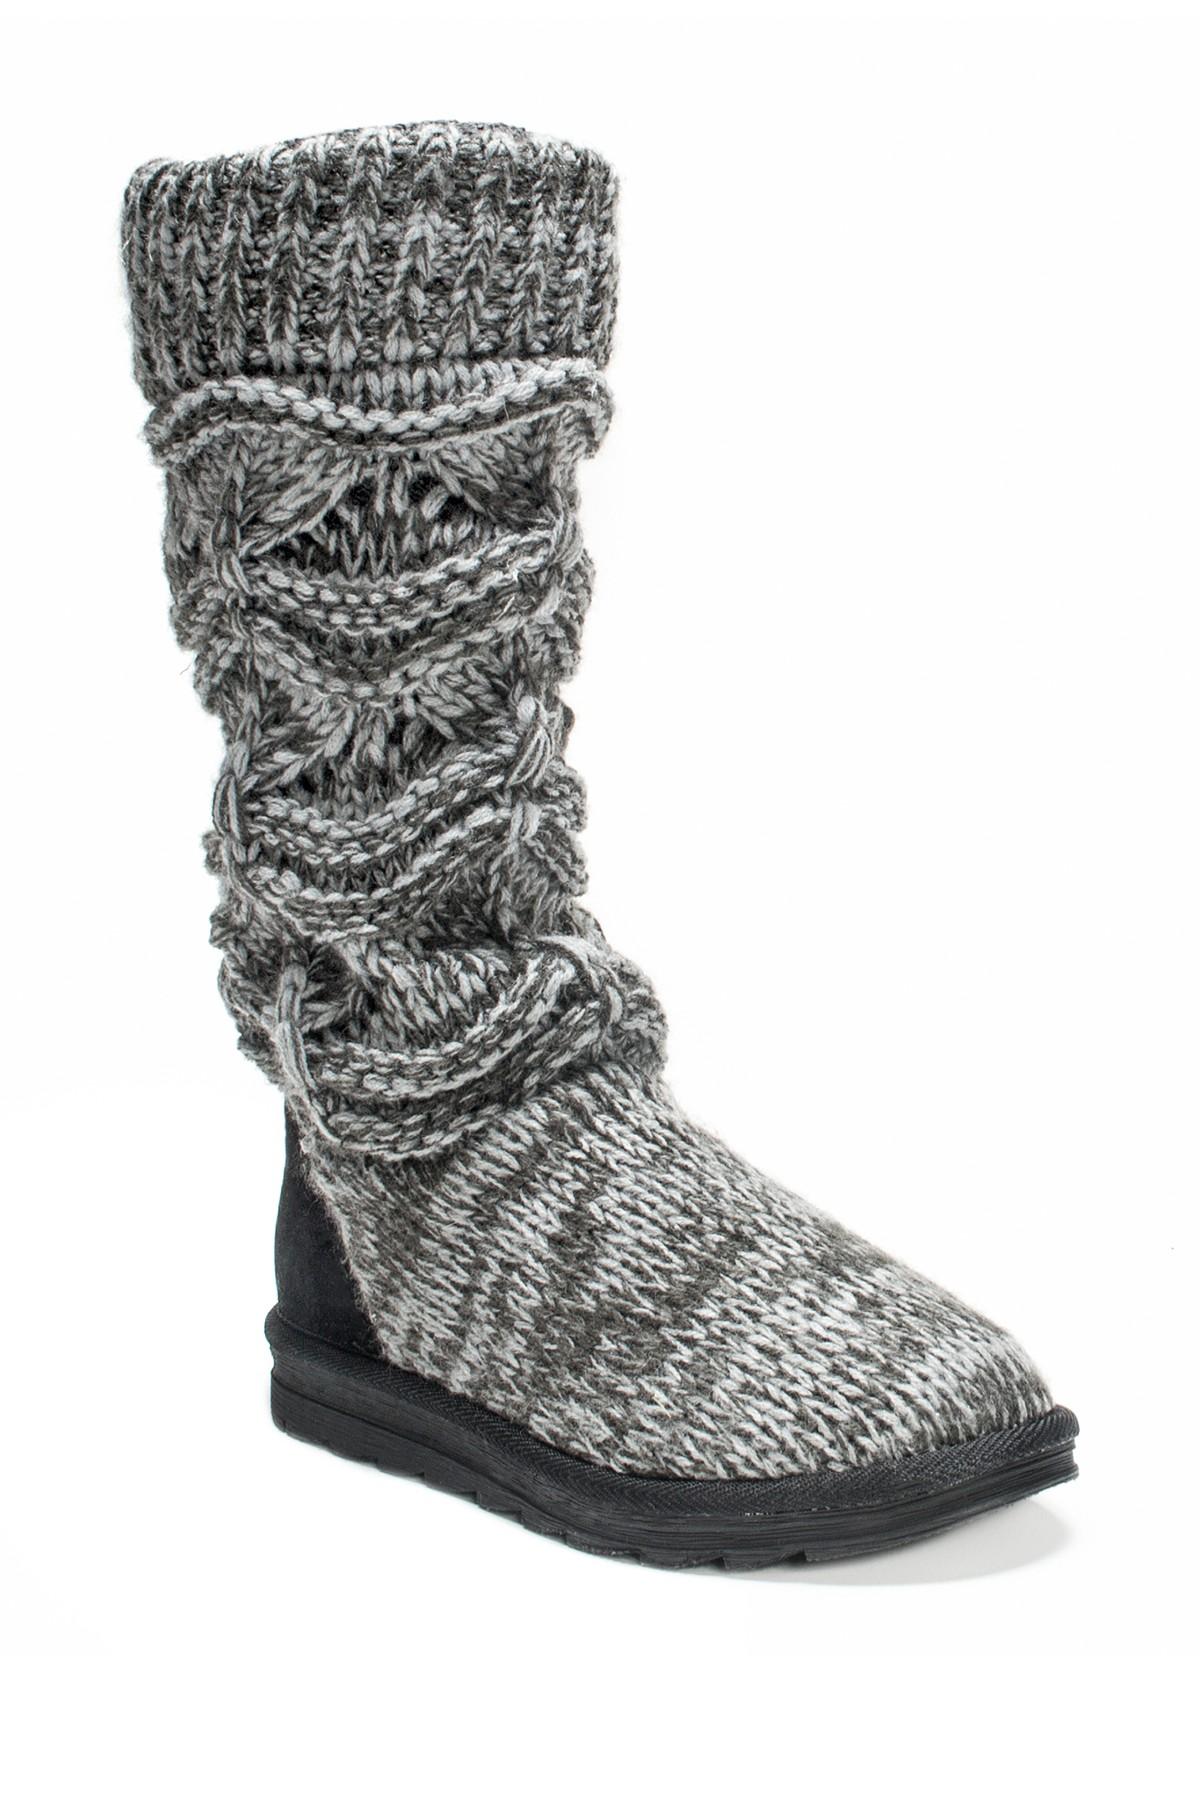 MUK LUKS Jamie Knit Slipper Boot | Womens Fashion Street | Pinterest